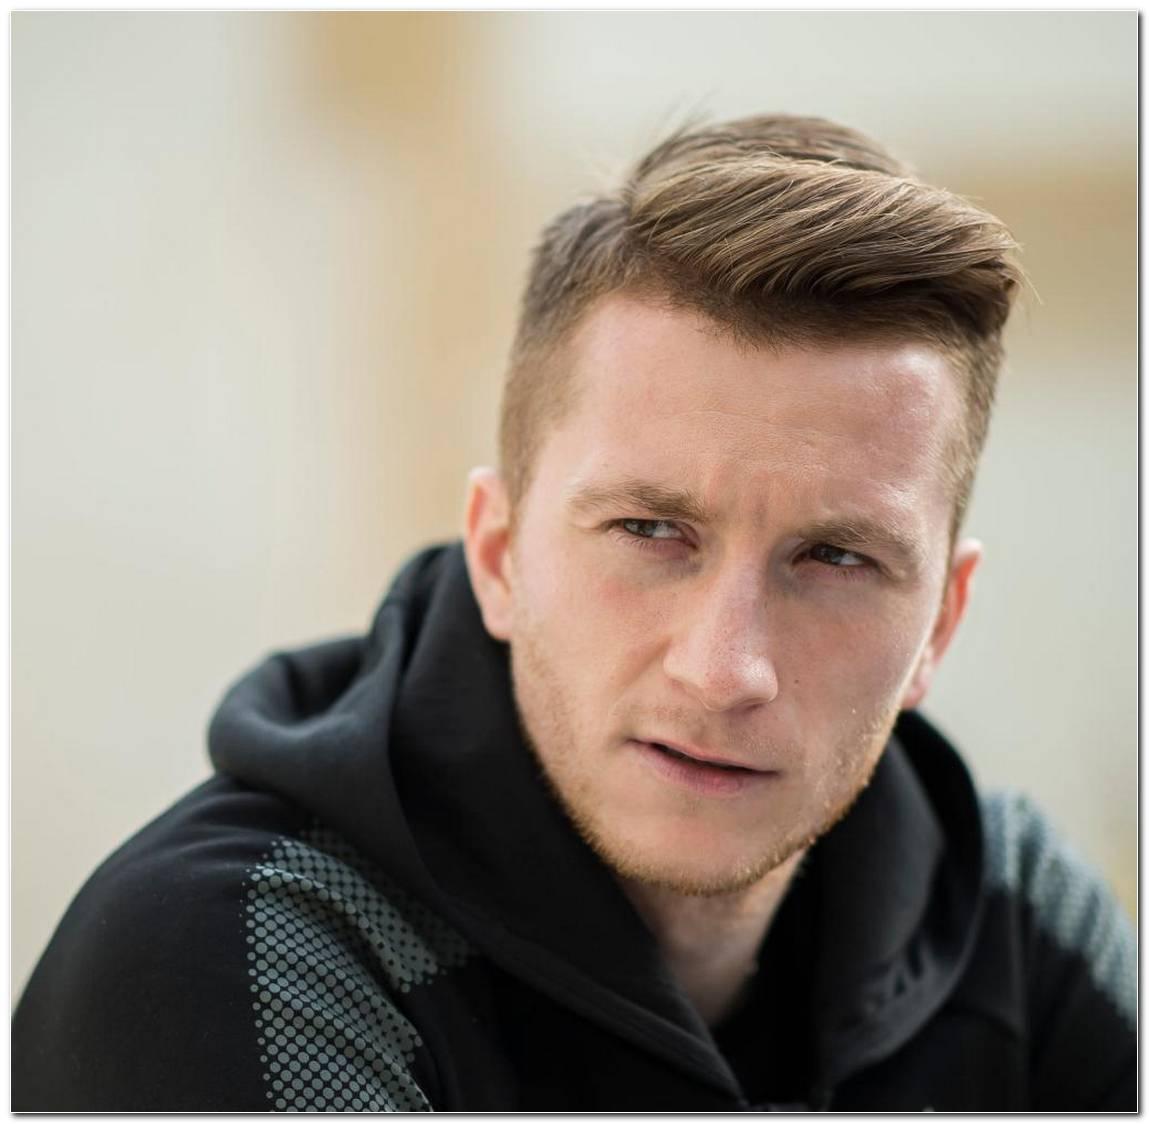 Marco Reus Frisur Dortmund